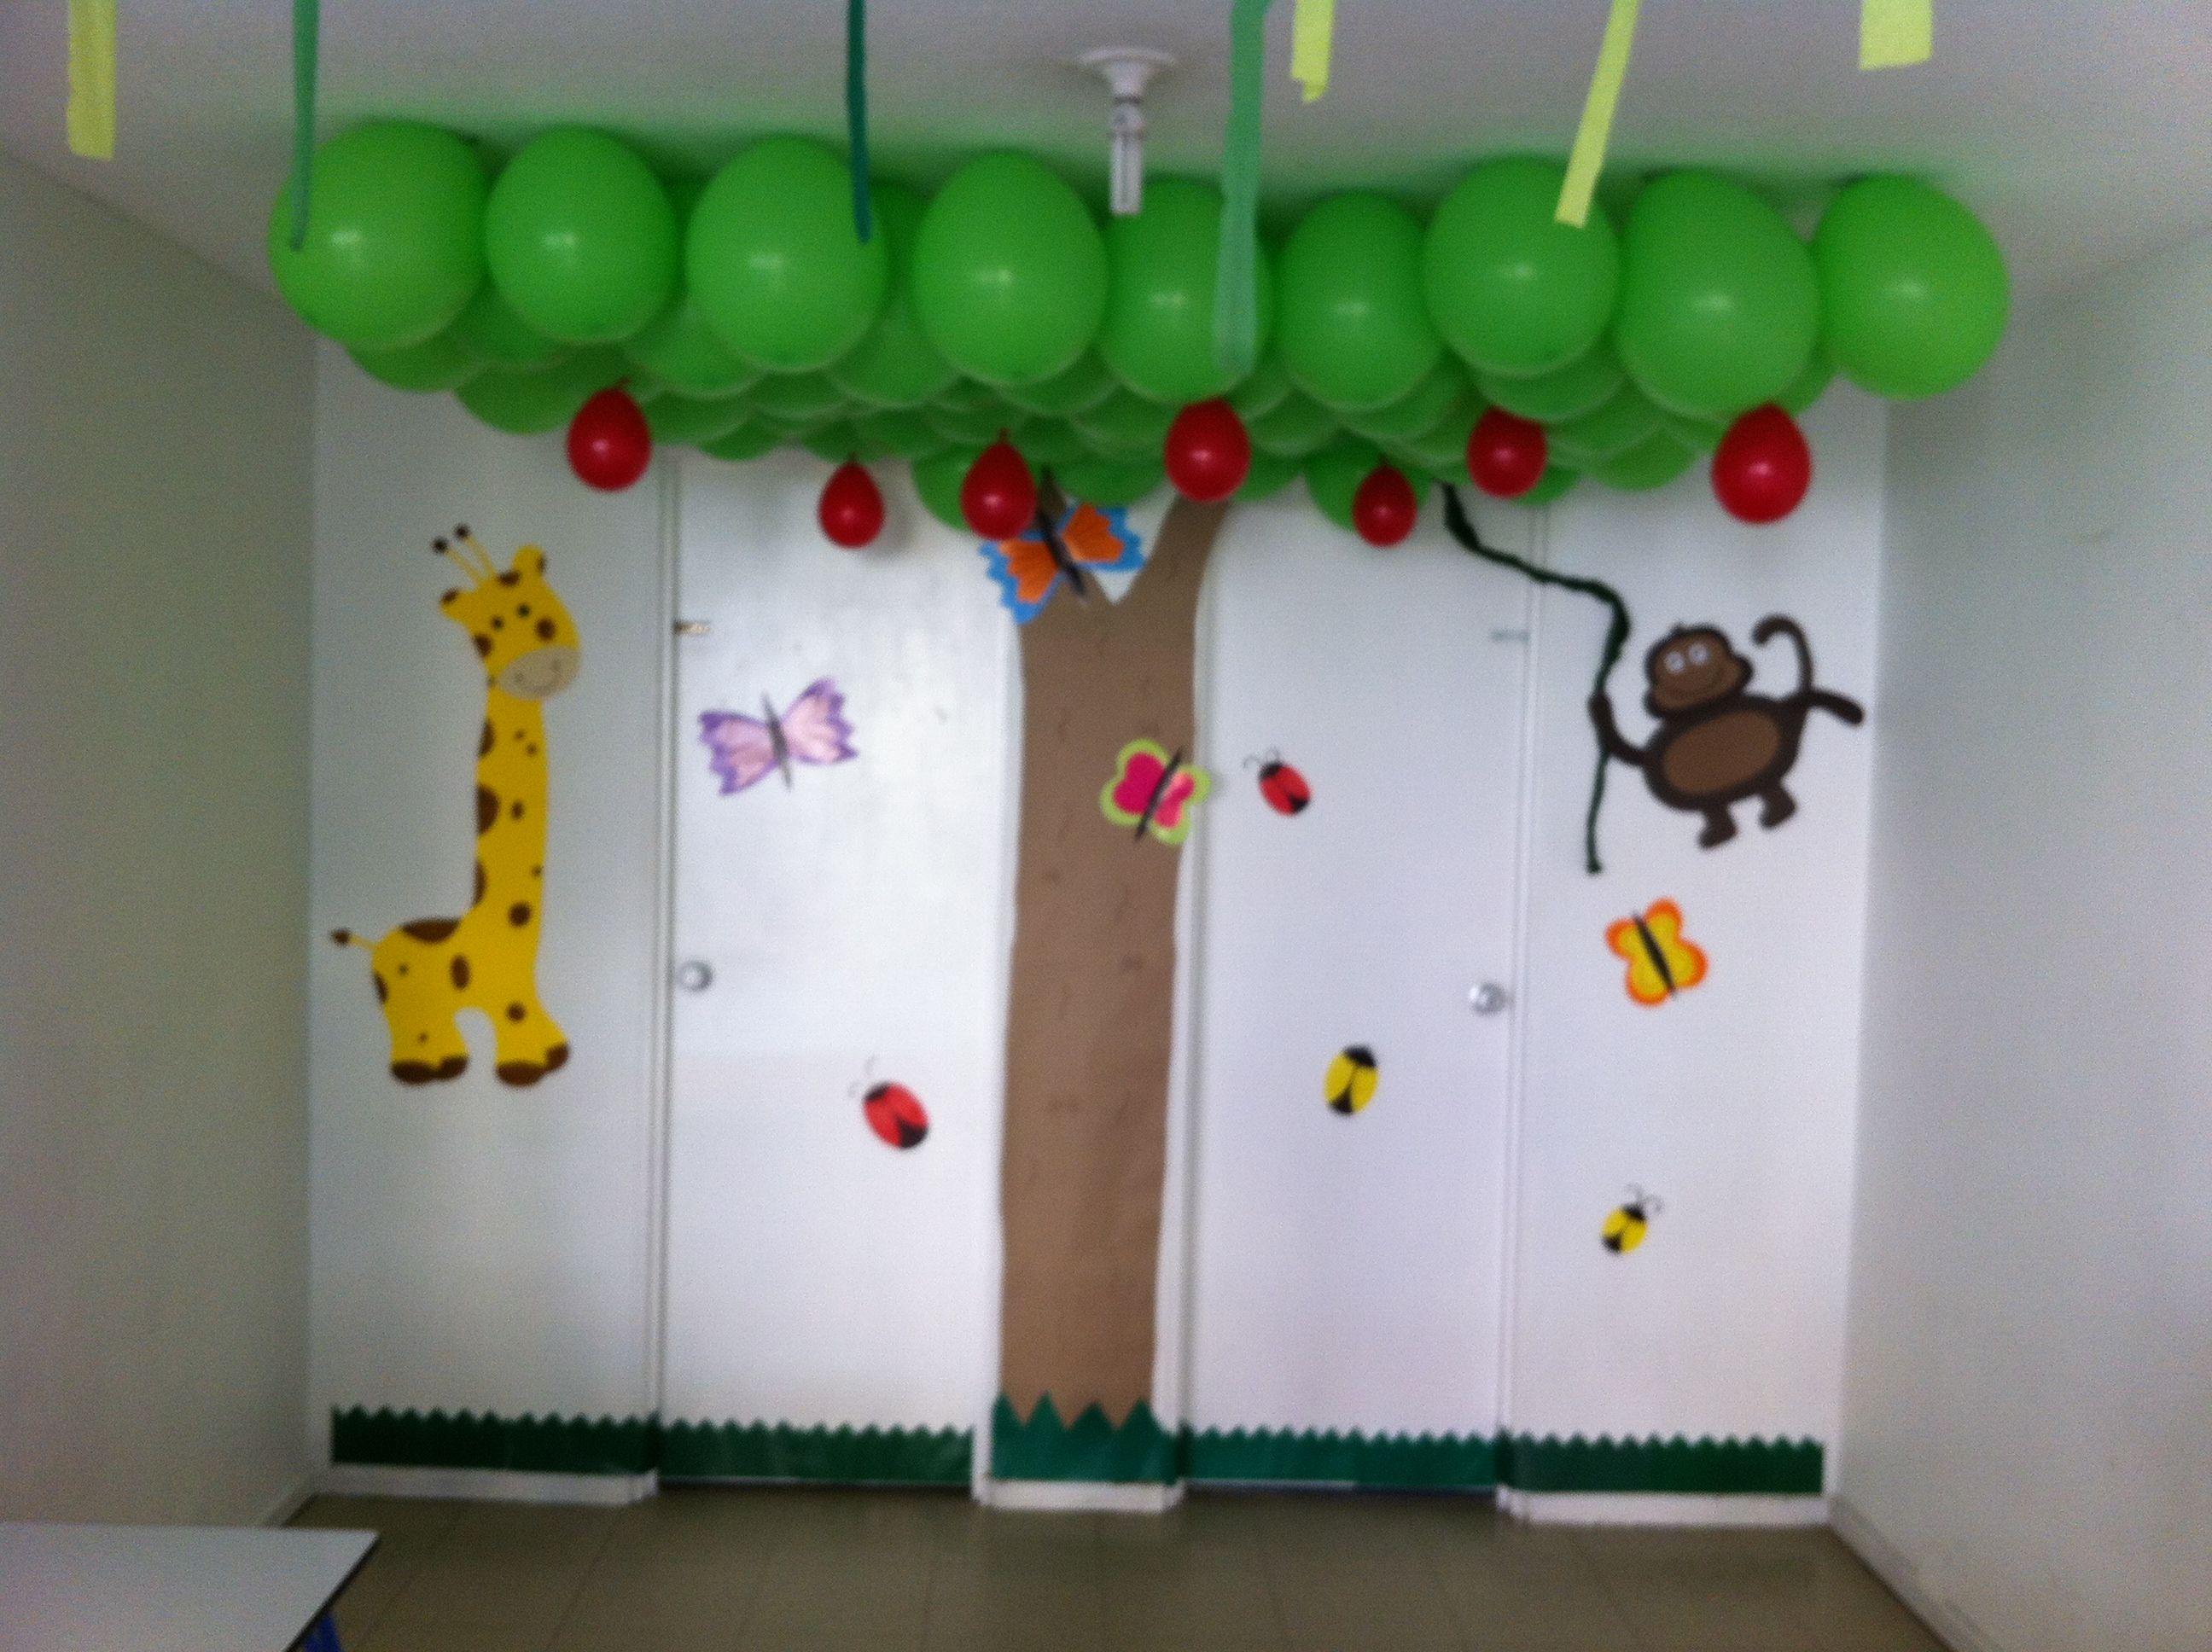 Decoraci n de aula infantil decoraci n atividades para for Decoracion puerta aula infantil